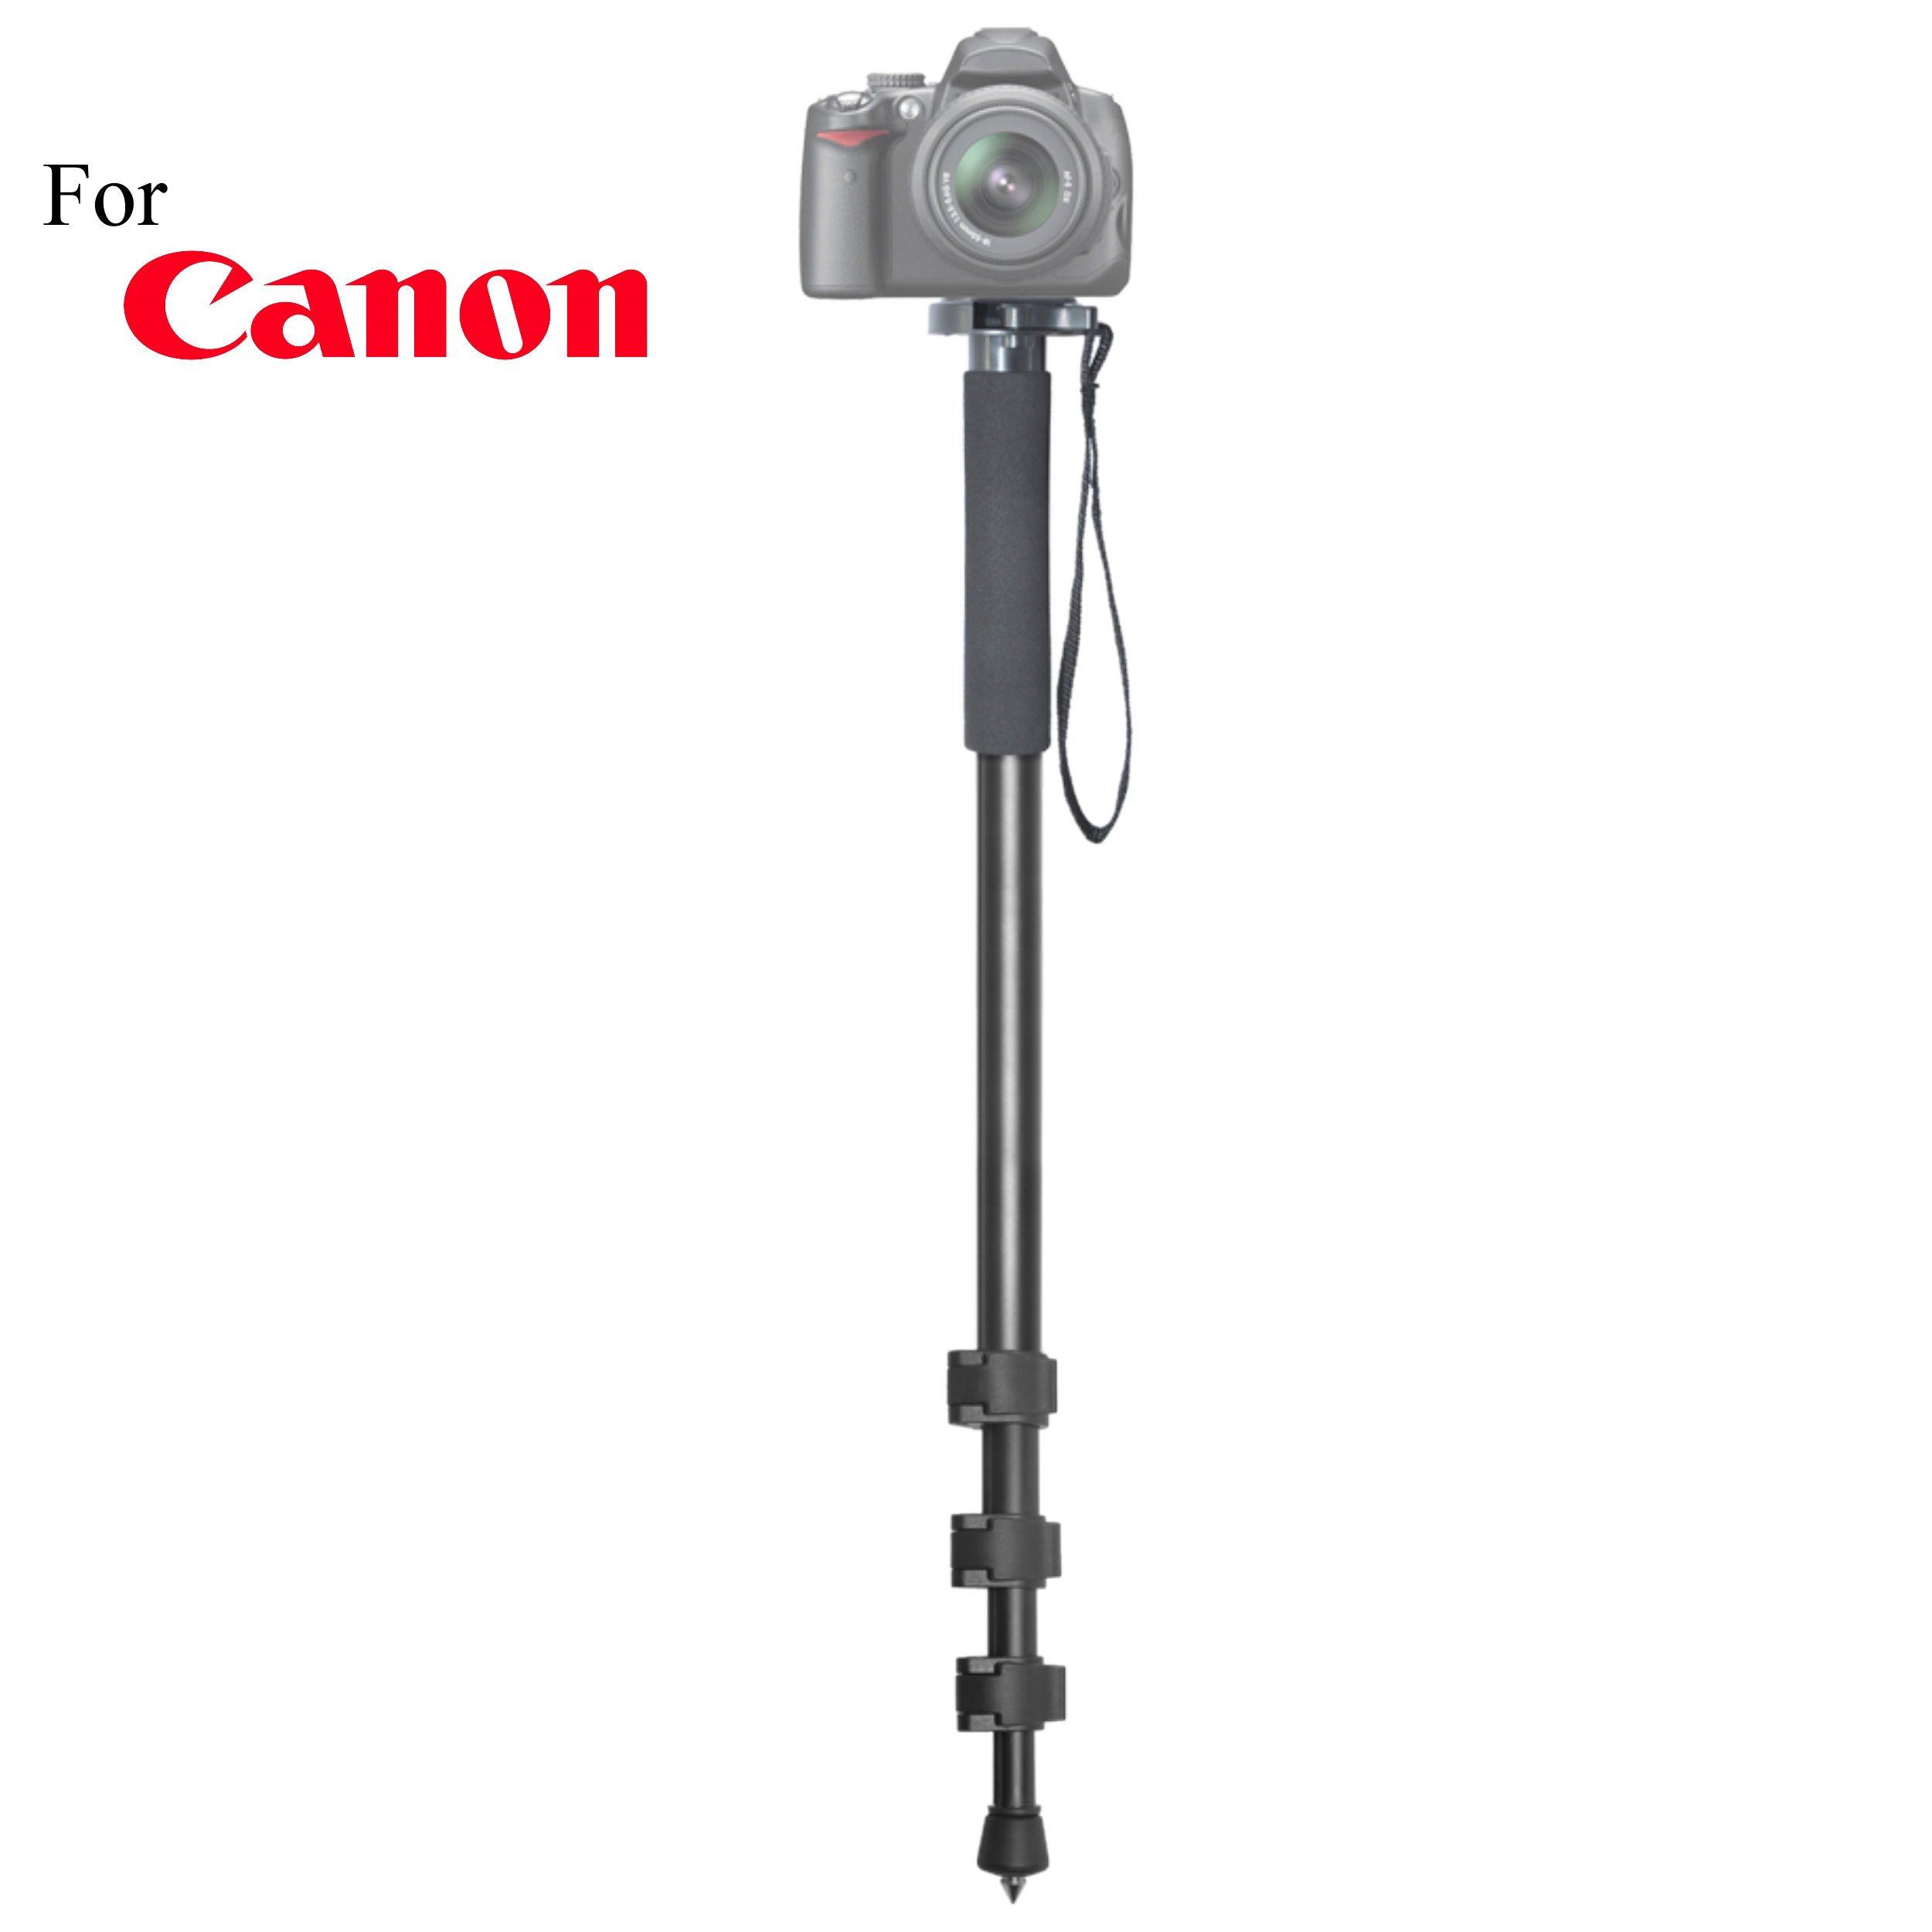 Versatile 72'' Monopod Camera Stick + Quick Release for Canon EOS Kiss Digital, EOS Kiss Digital N, EOS Kiss Digital X, EOS Kiss X2, EOS Kiss X3, EOS Kiss X4 Cameras: Collapsible Mono pod, Mono-pod